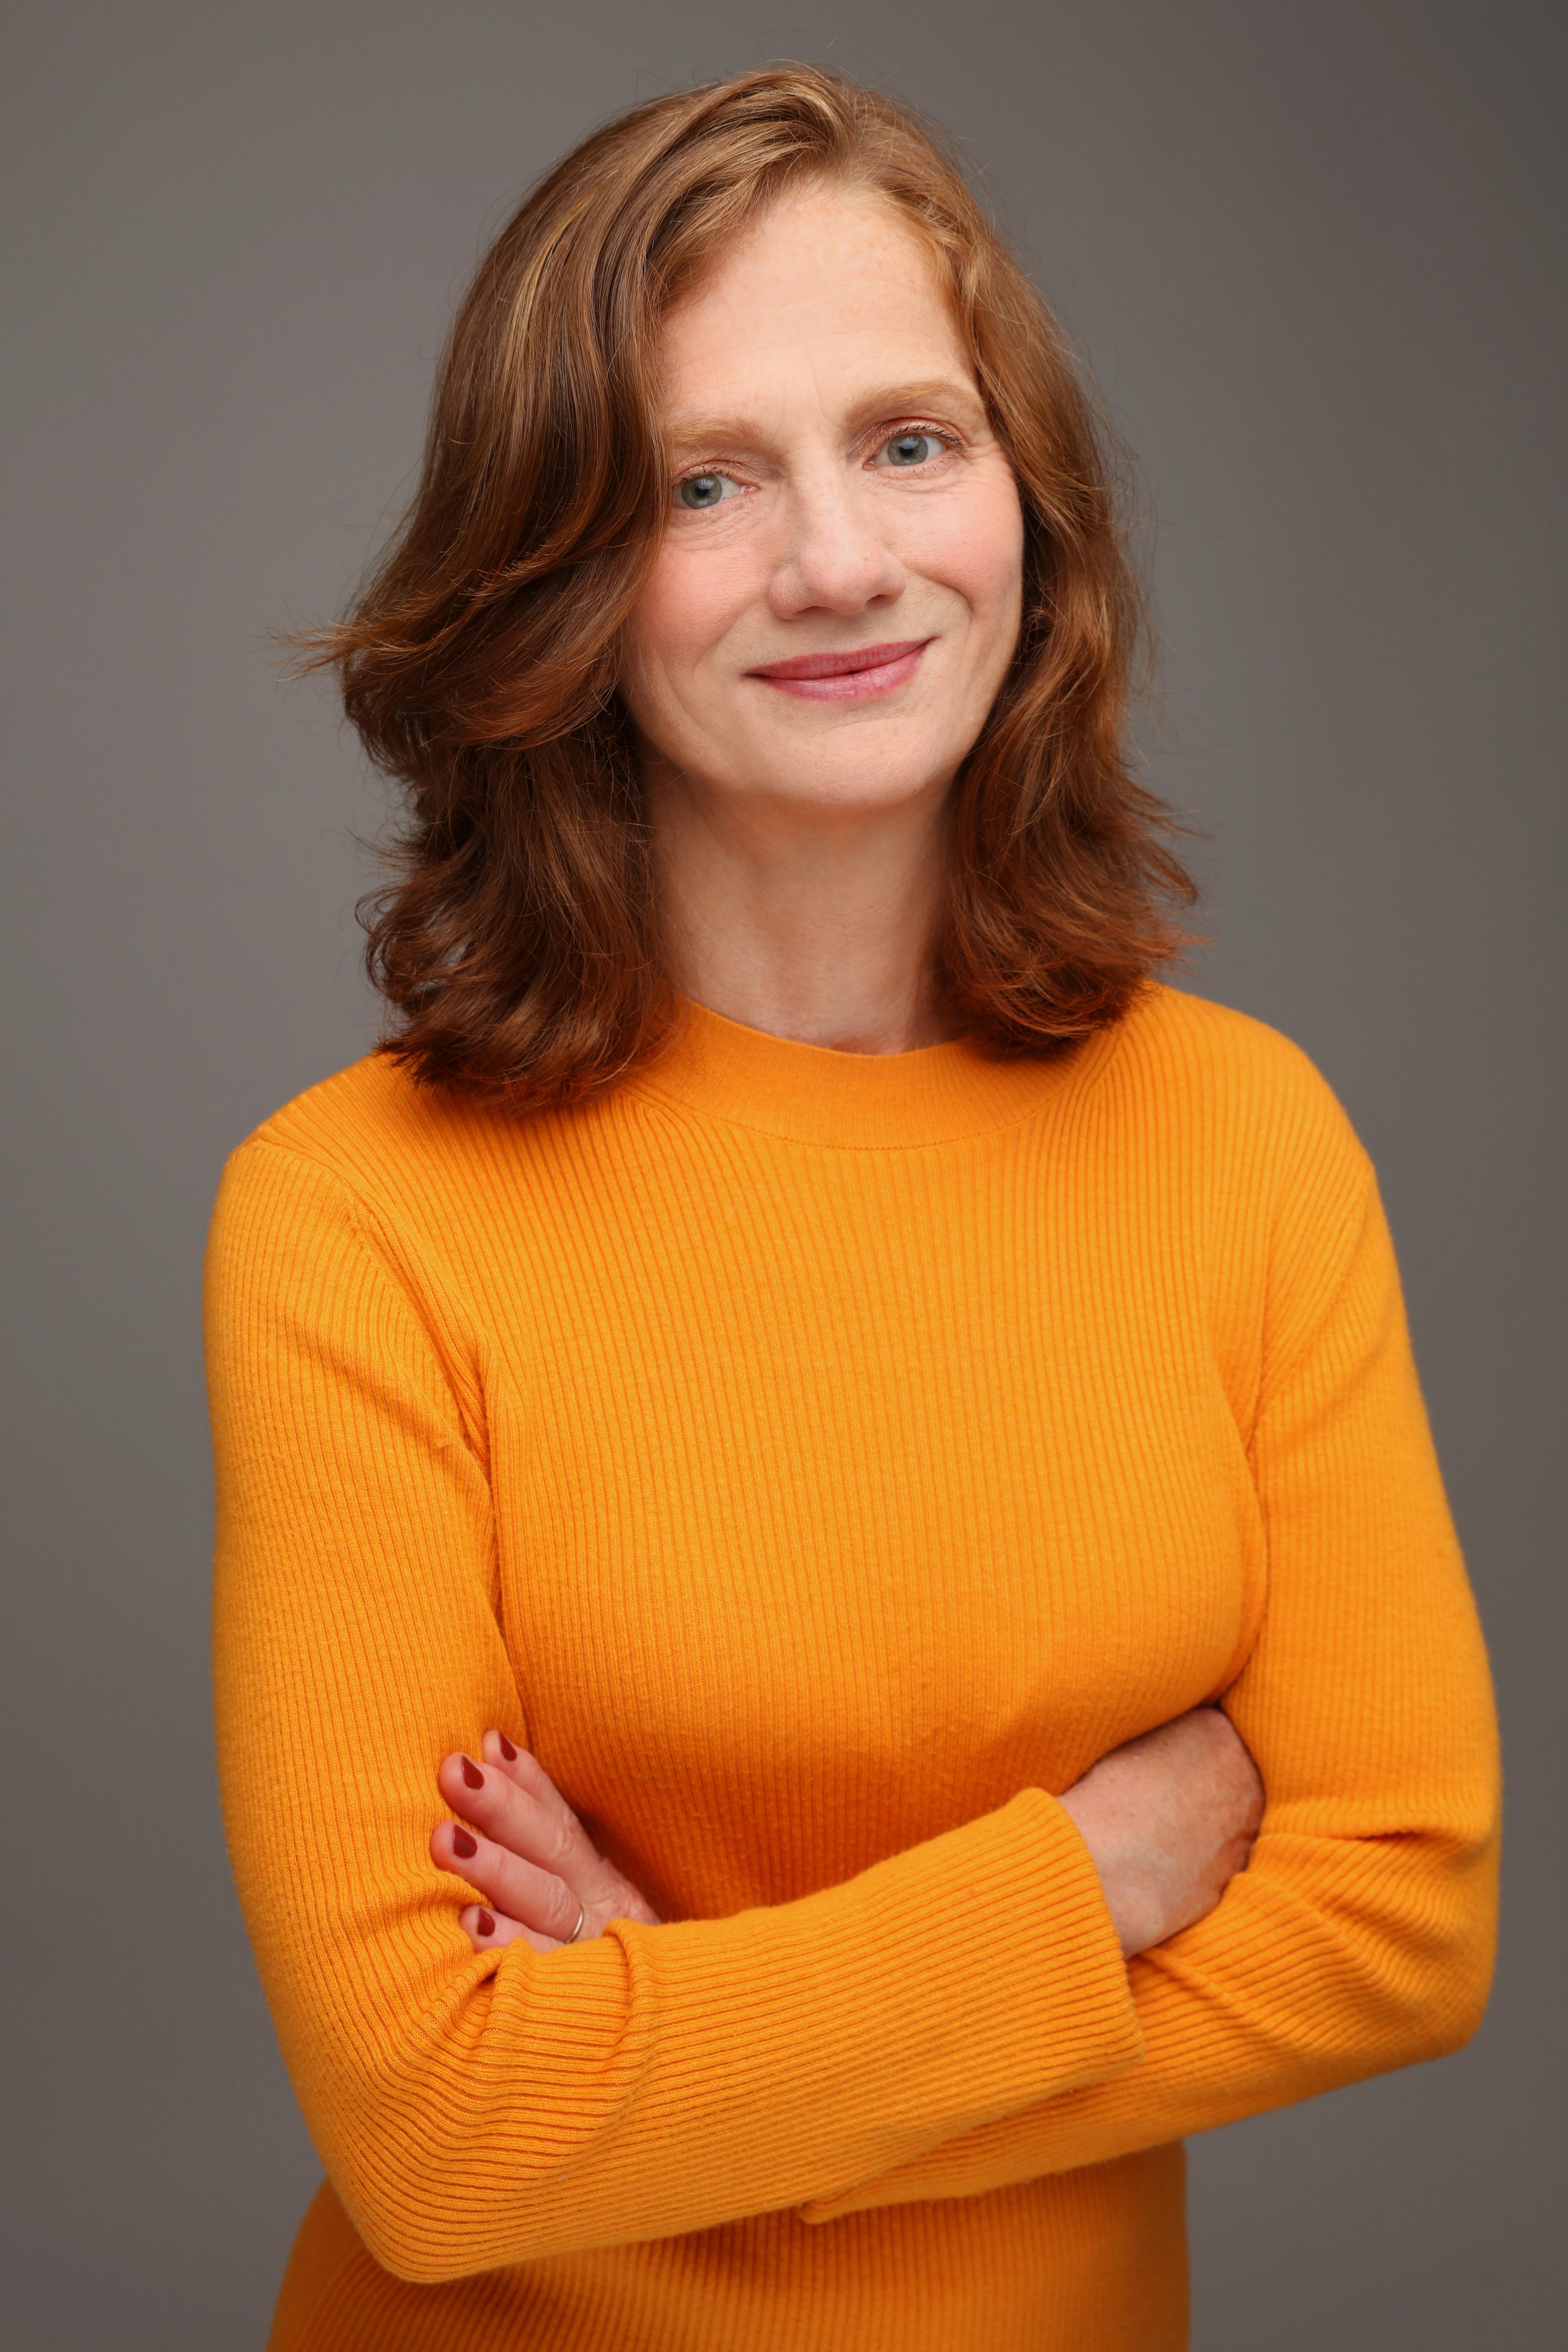 Natalie Cox